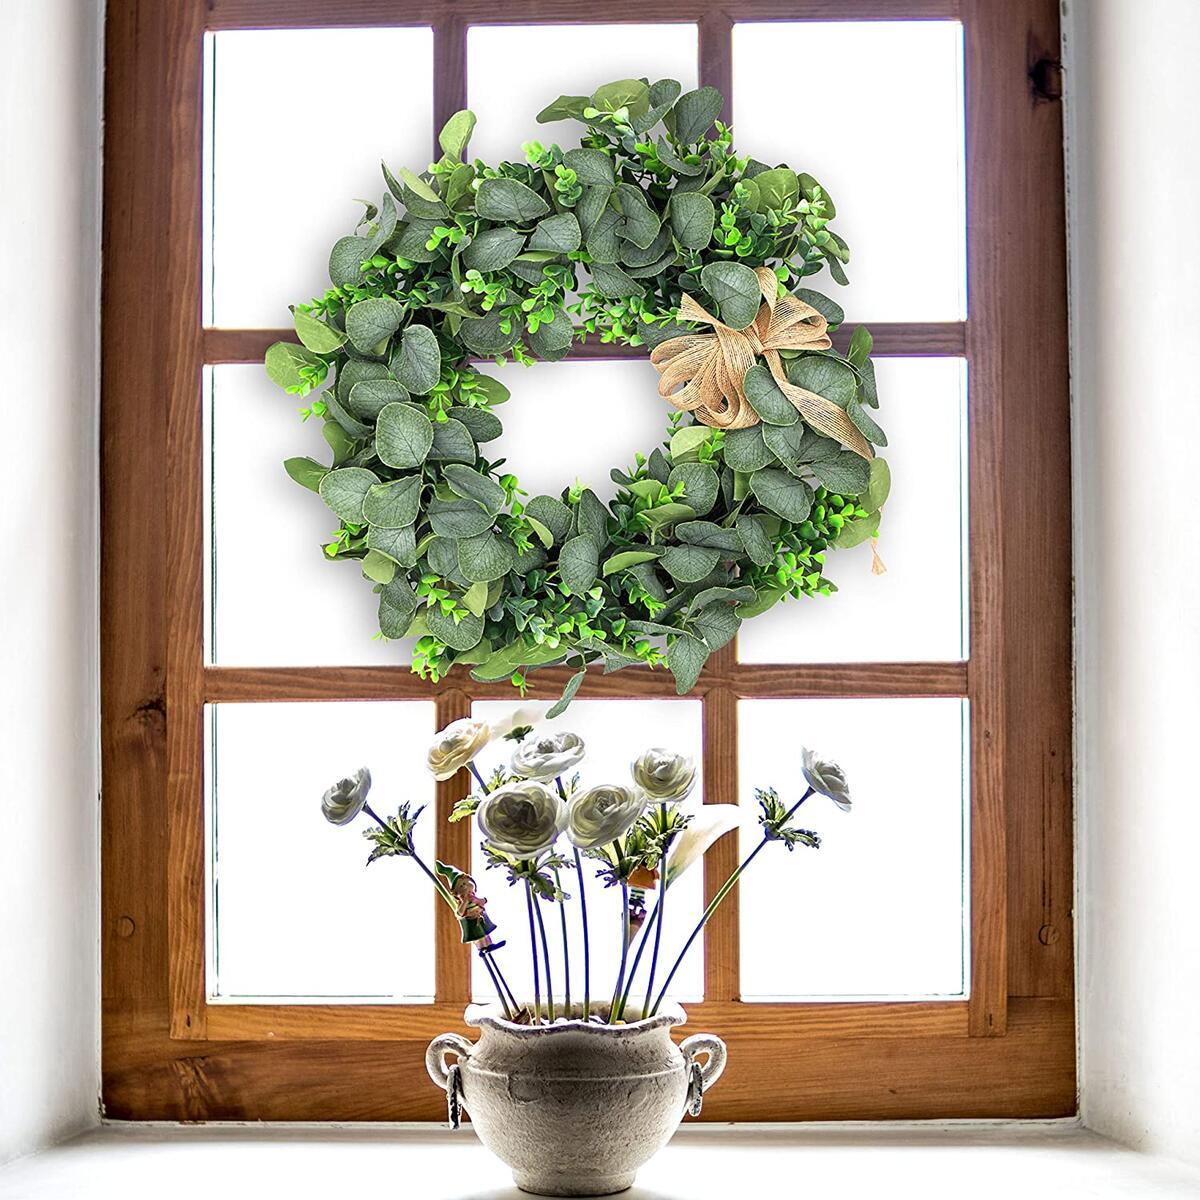 Eucalyptus Wreath, Summer Wreaths for Front Door, Front Door Decor, Wreaths for Front Door, Greenery Wreath 20 Inches